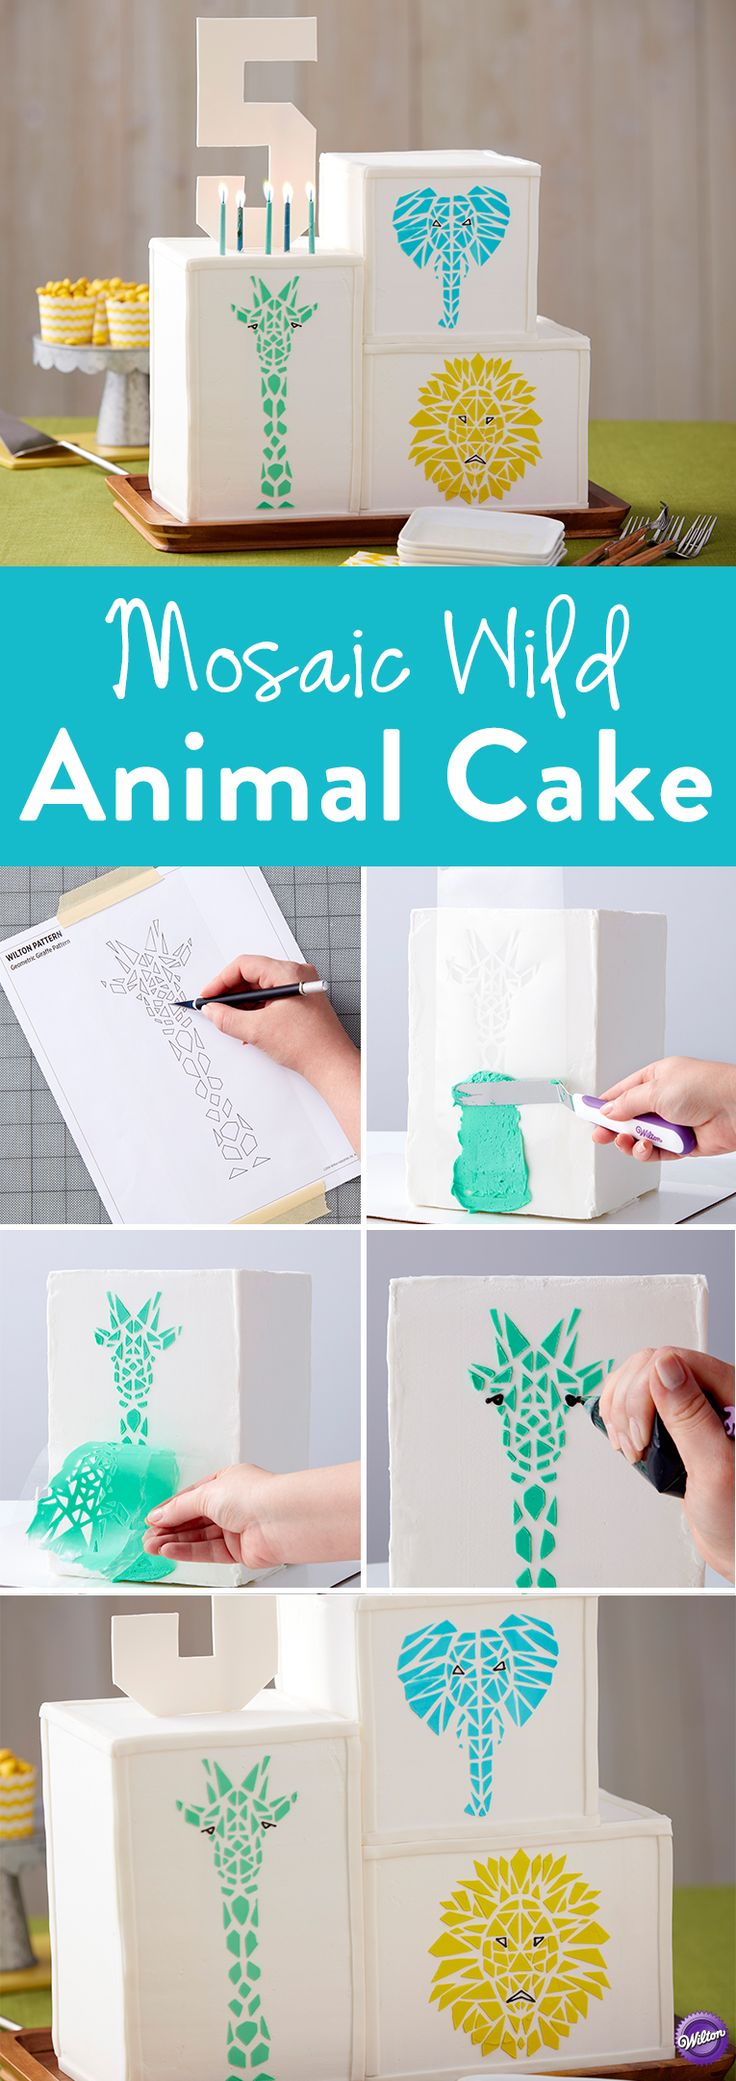 How to Make a Mosaic Animal Cake - This Mosaic Animal Cake is sure to impress…